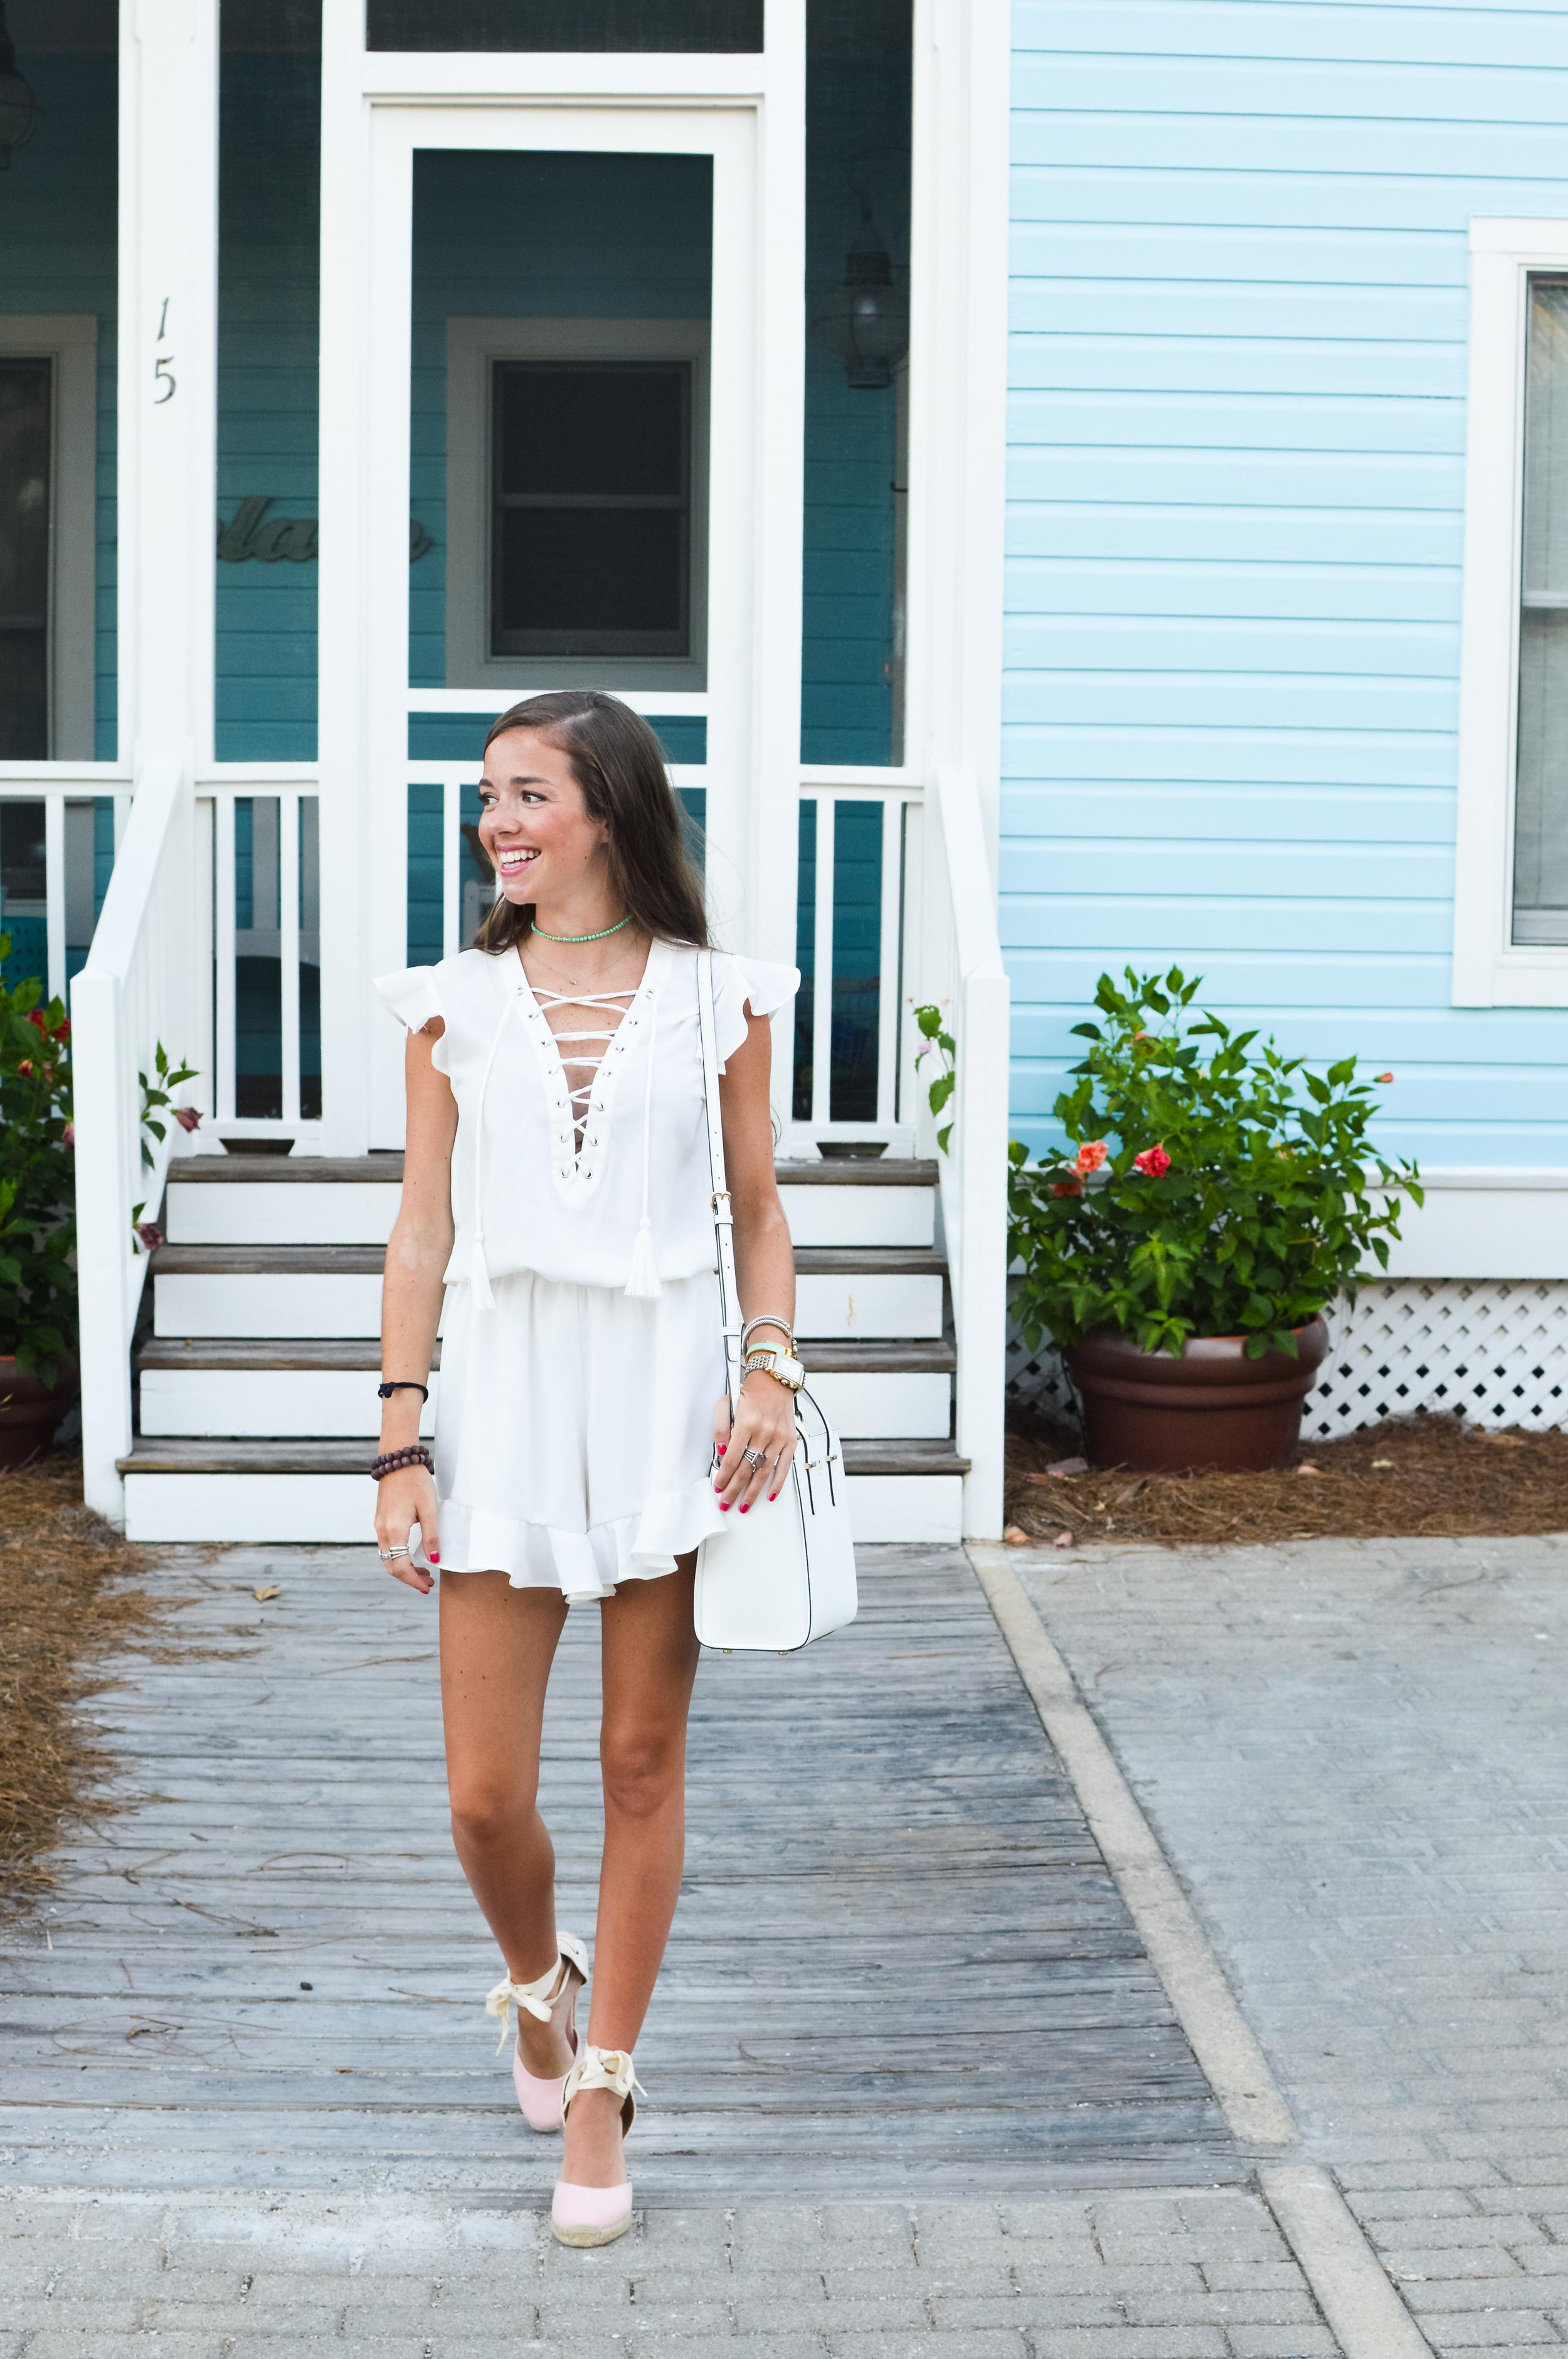 lcb_style_fashion_blogger_whiteromper (2 of 37).jpg